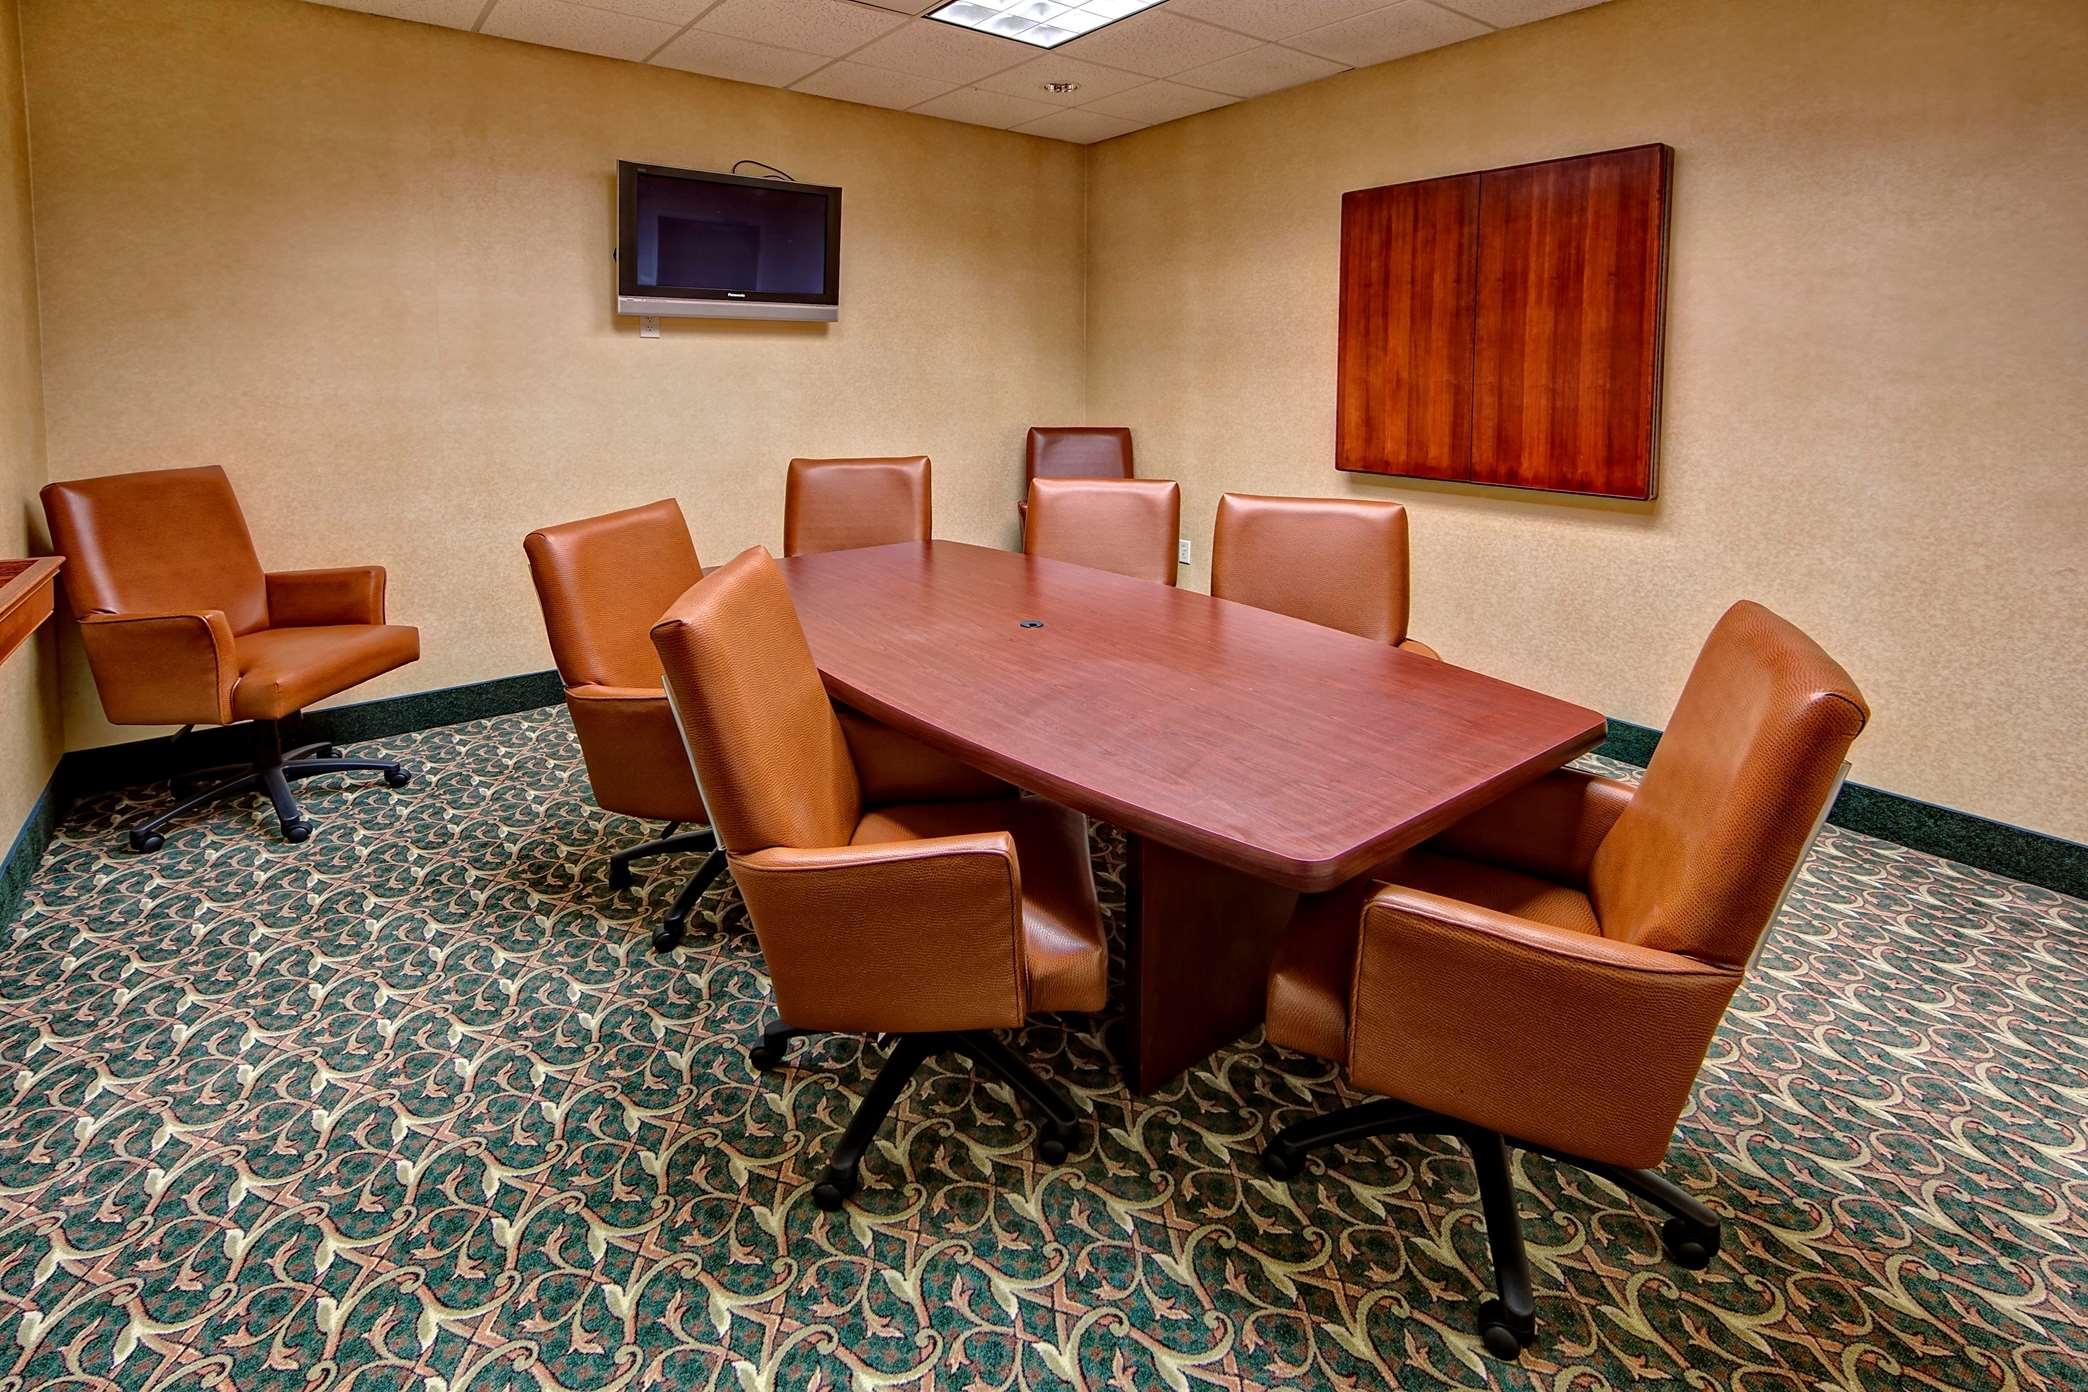 Hampton Inn & Suites Cashiers-Sapphire Valley image 29